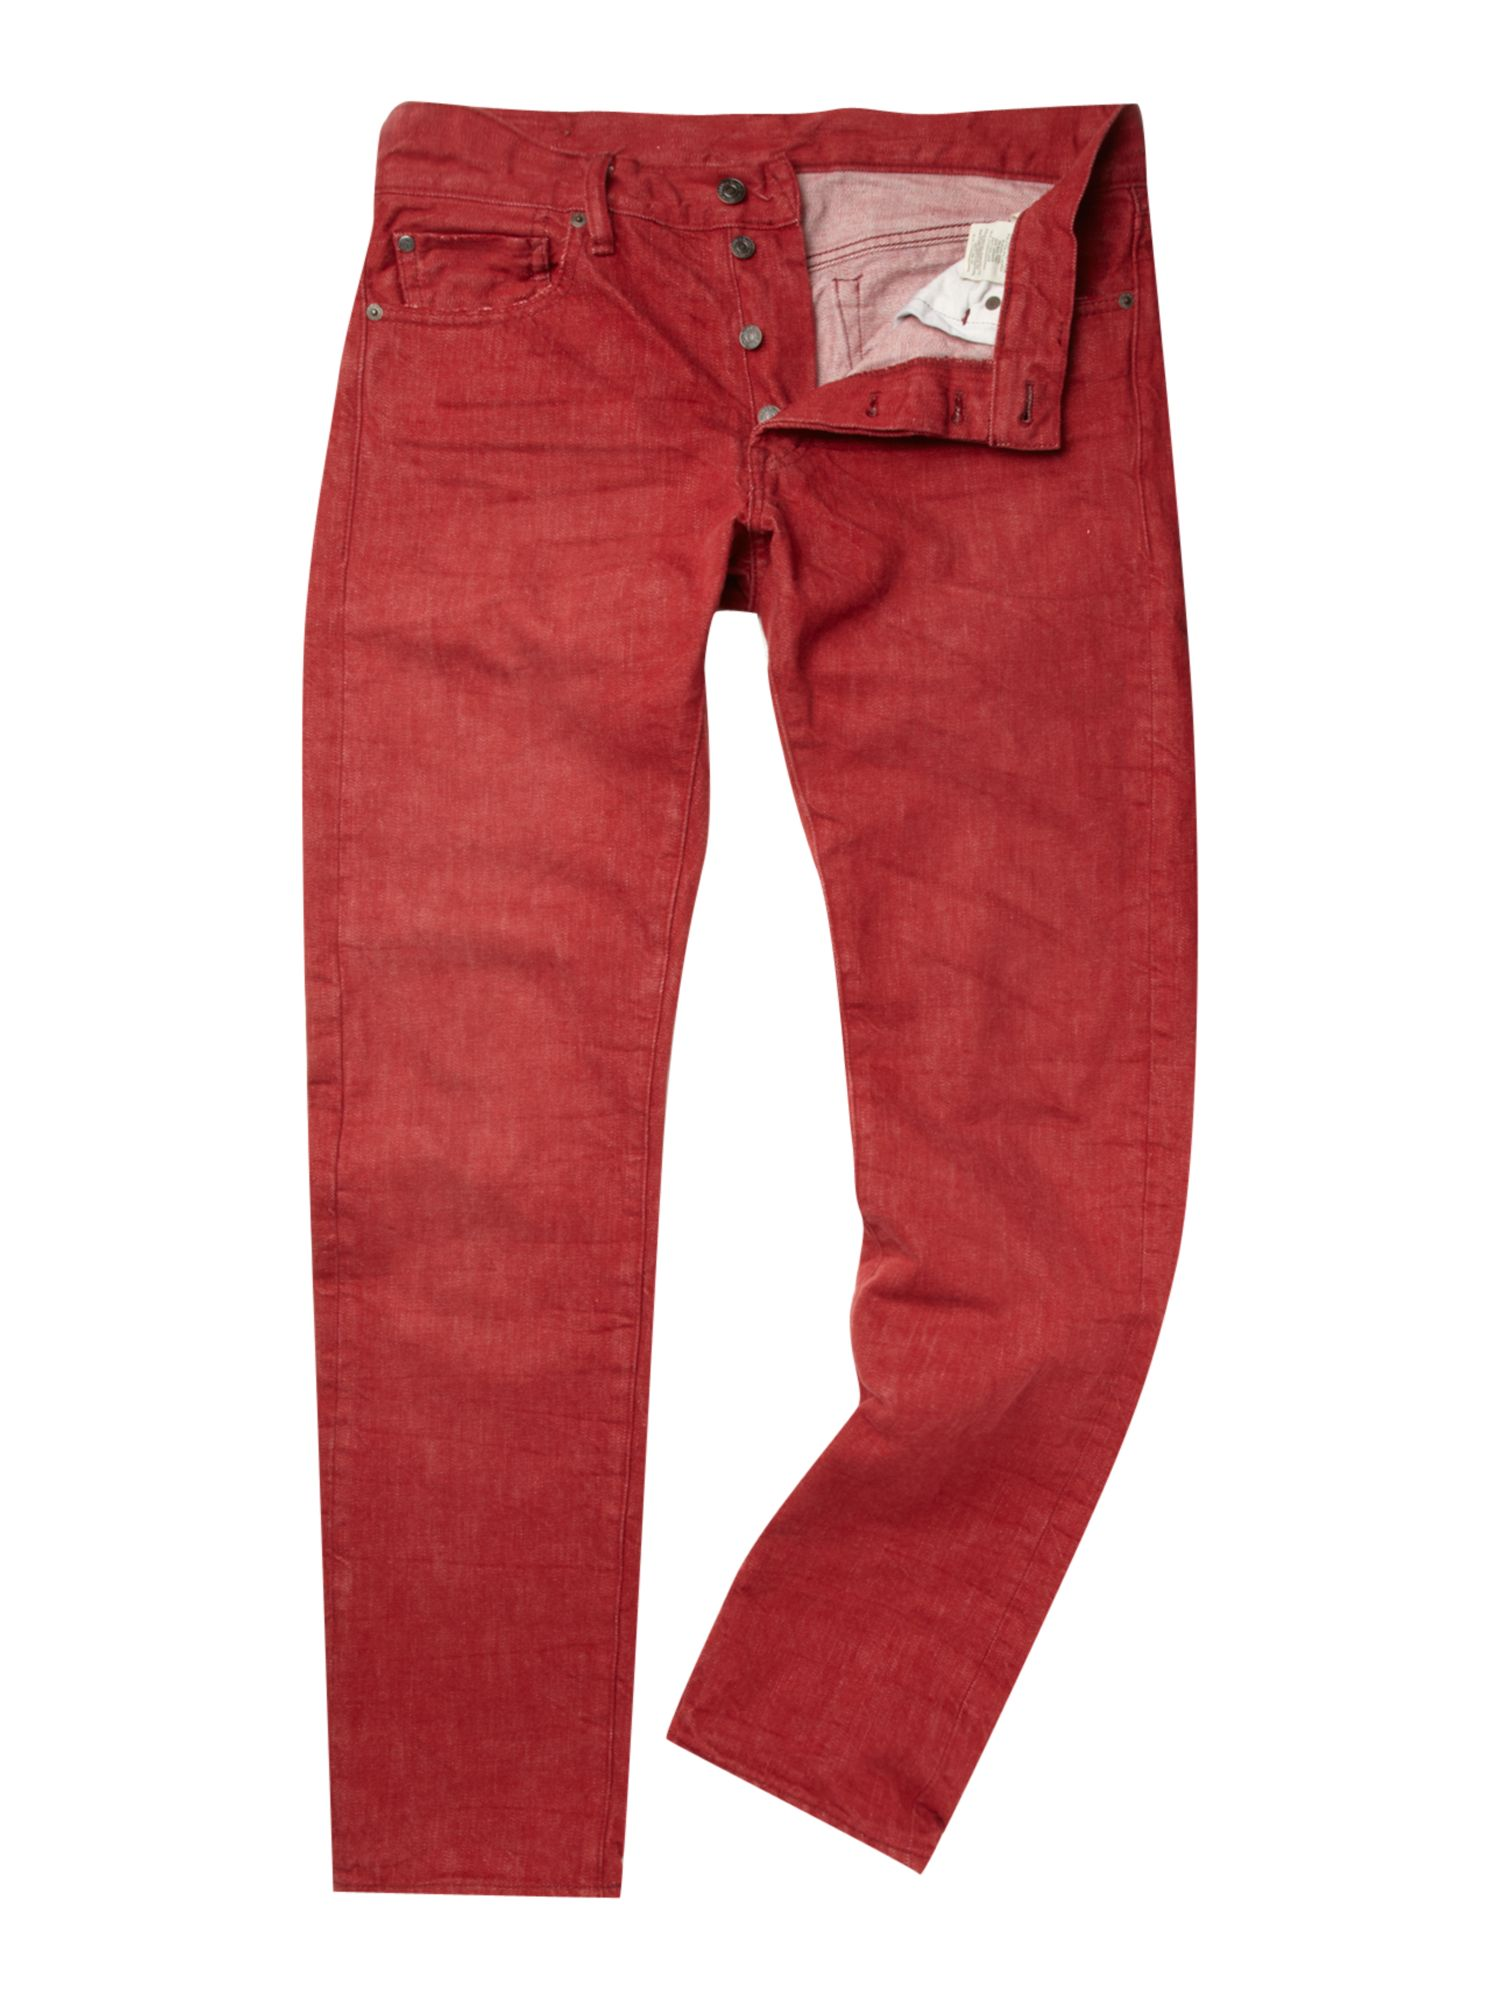 denim supply ralph lauren bright slim fit jeans in red. Black Bedroom Furniture Sets. Home Design Ideas